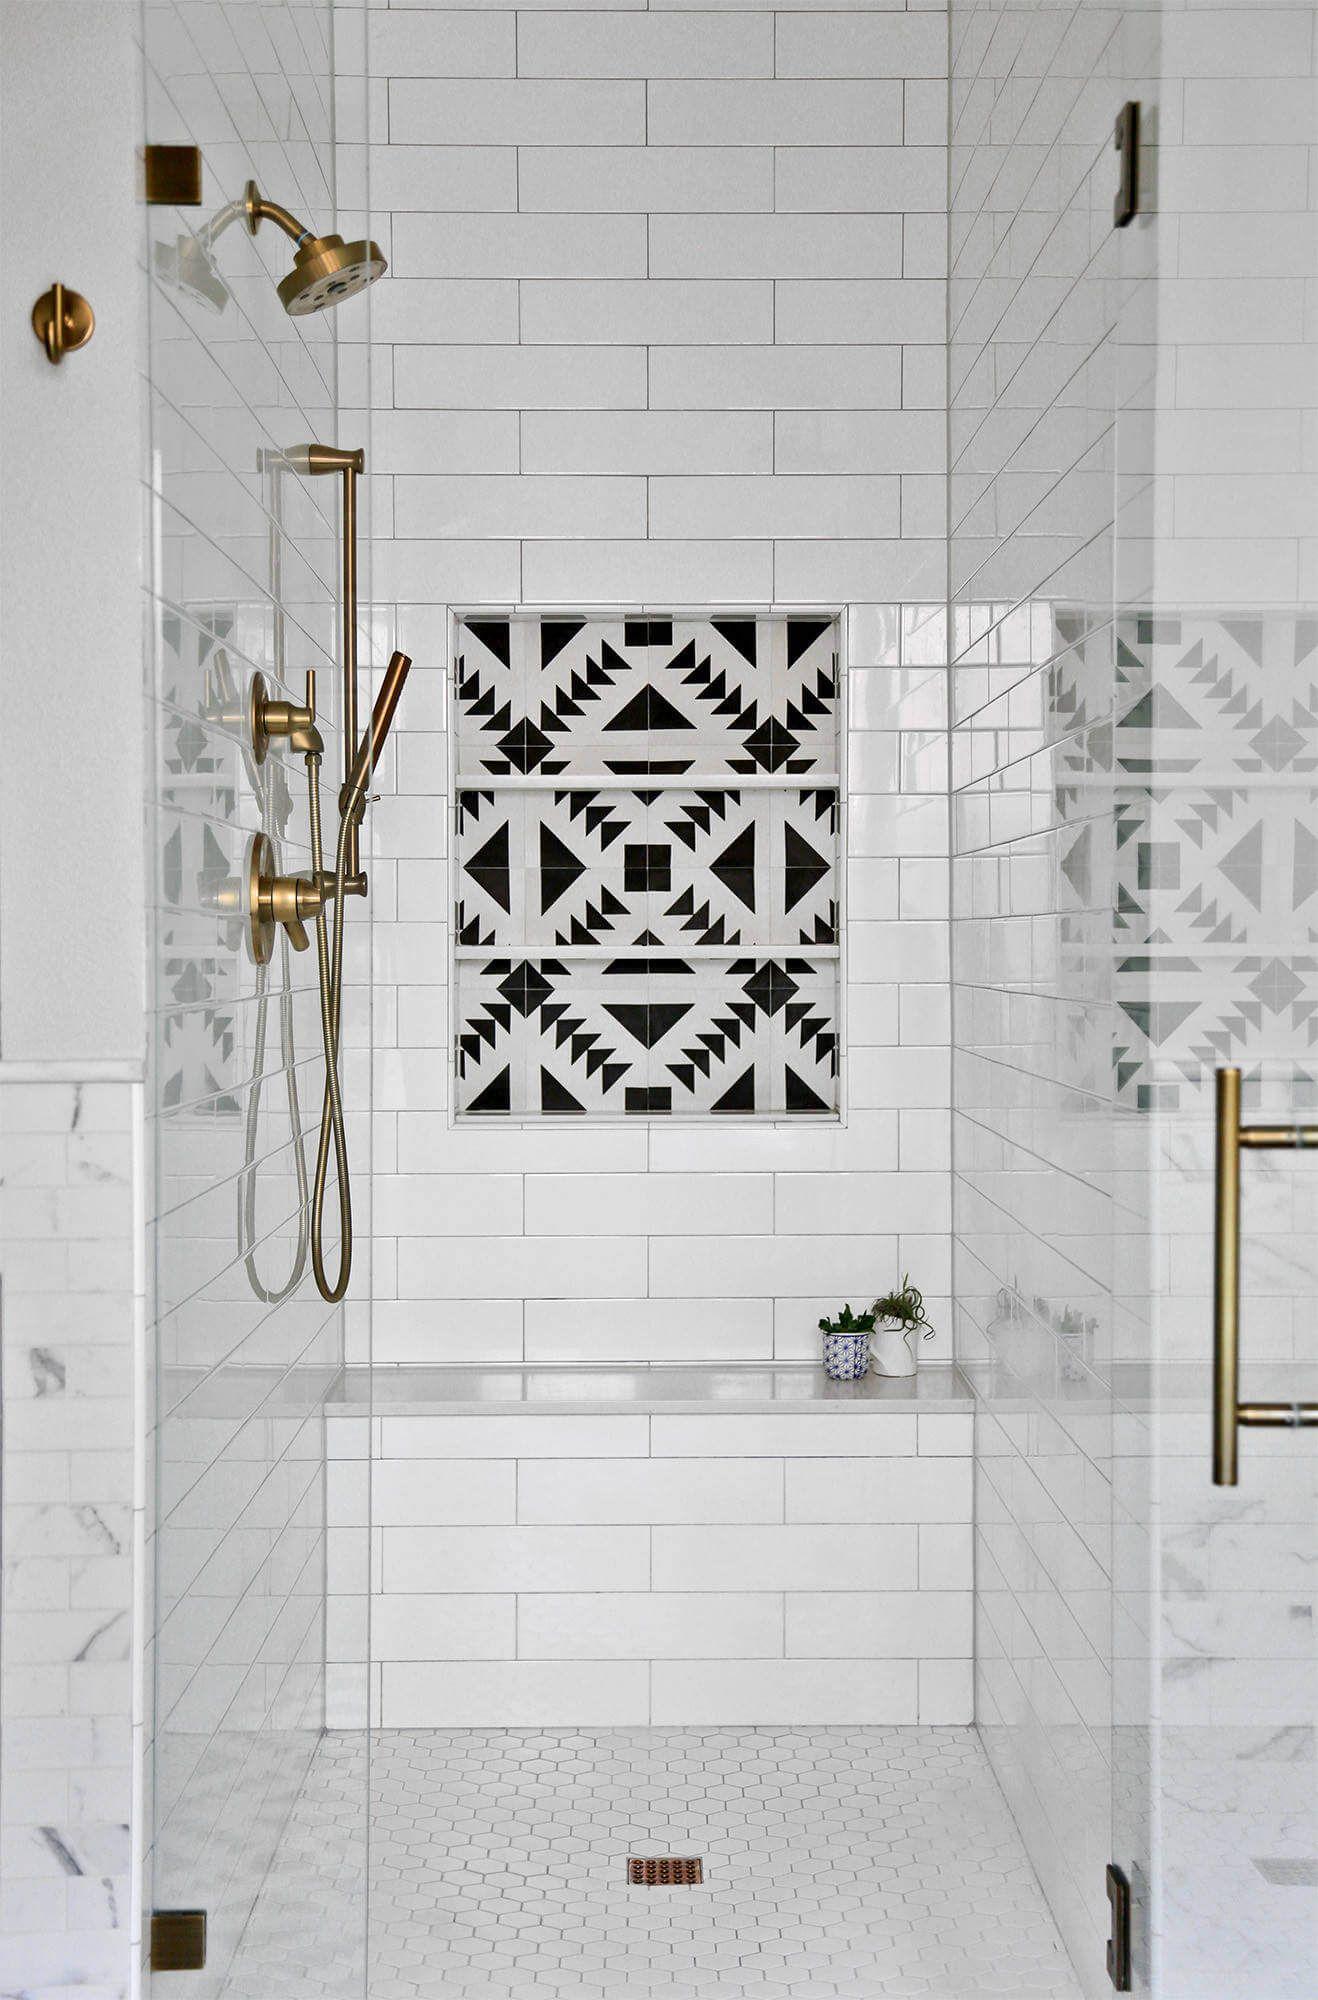 44 Modern Shower Tile Ideas And Designs 2020 Edition Shower Tile Farmhouse Master Bathroom Mold In Bathroom